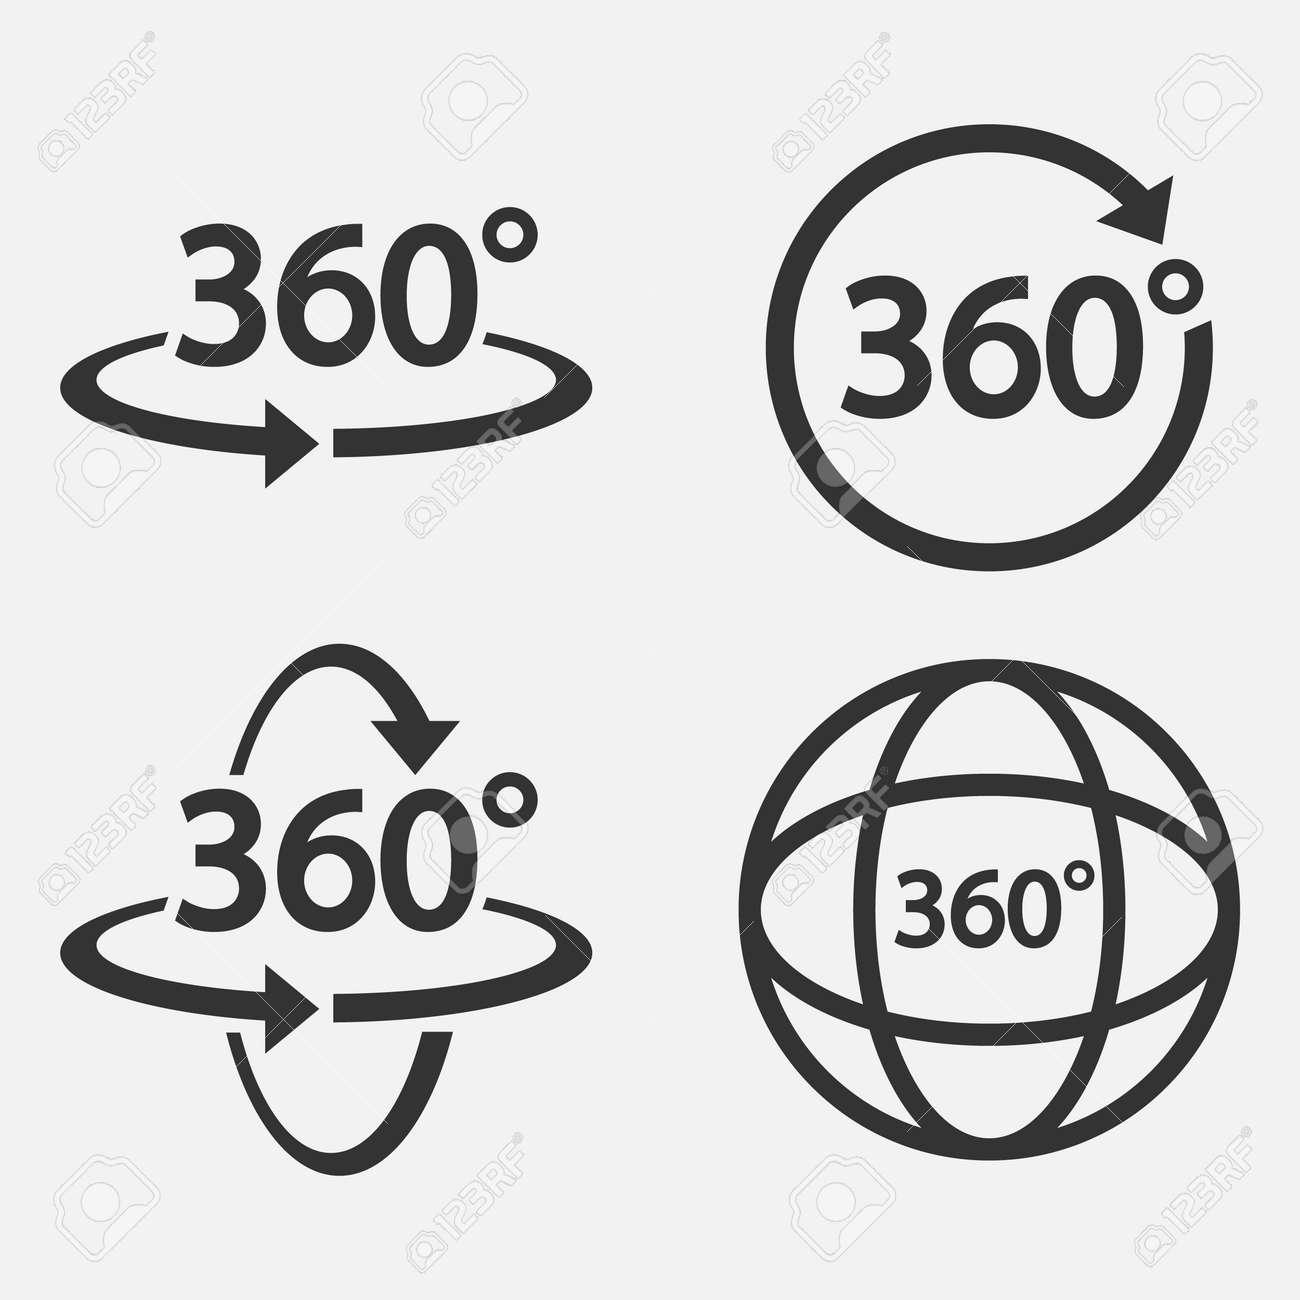 Set of 360 Icon. 360 degree view symbol Vector illustration. - 164871678